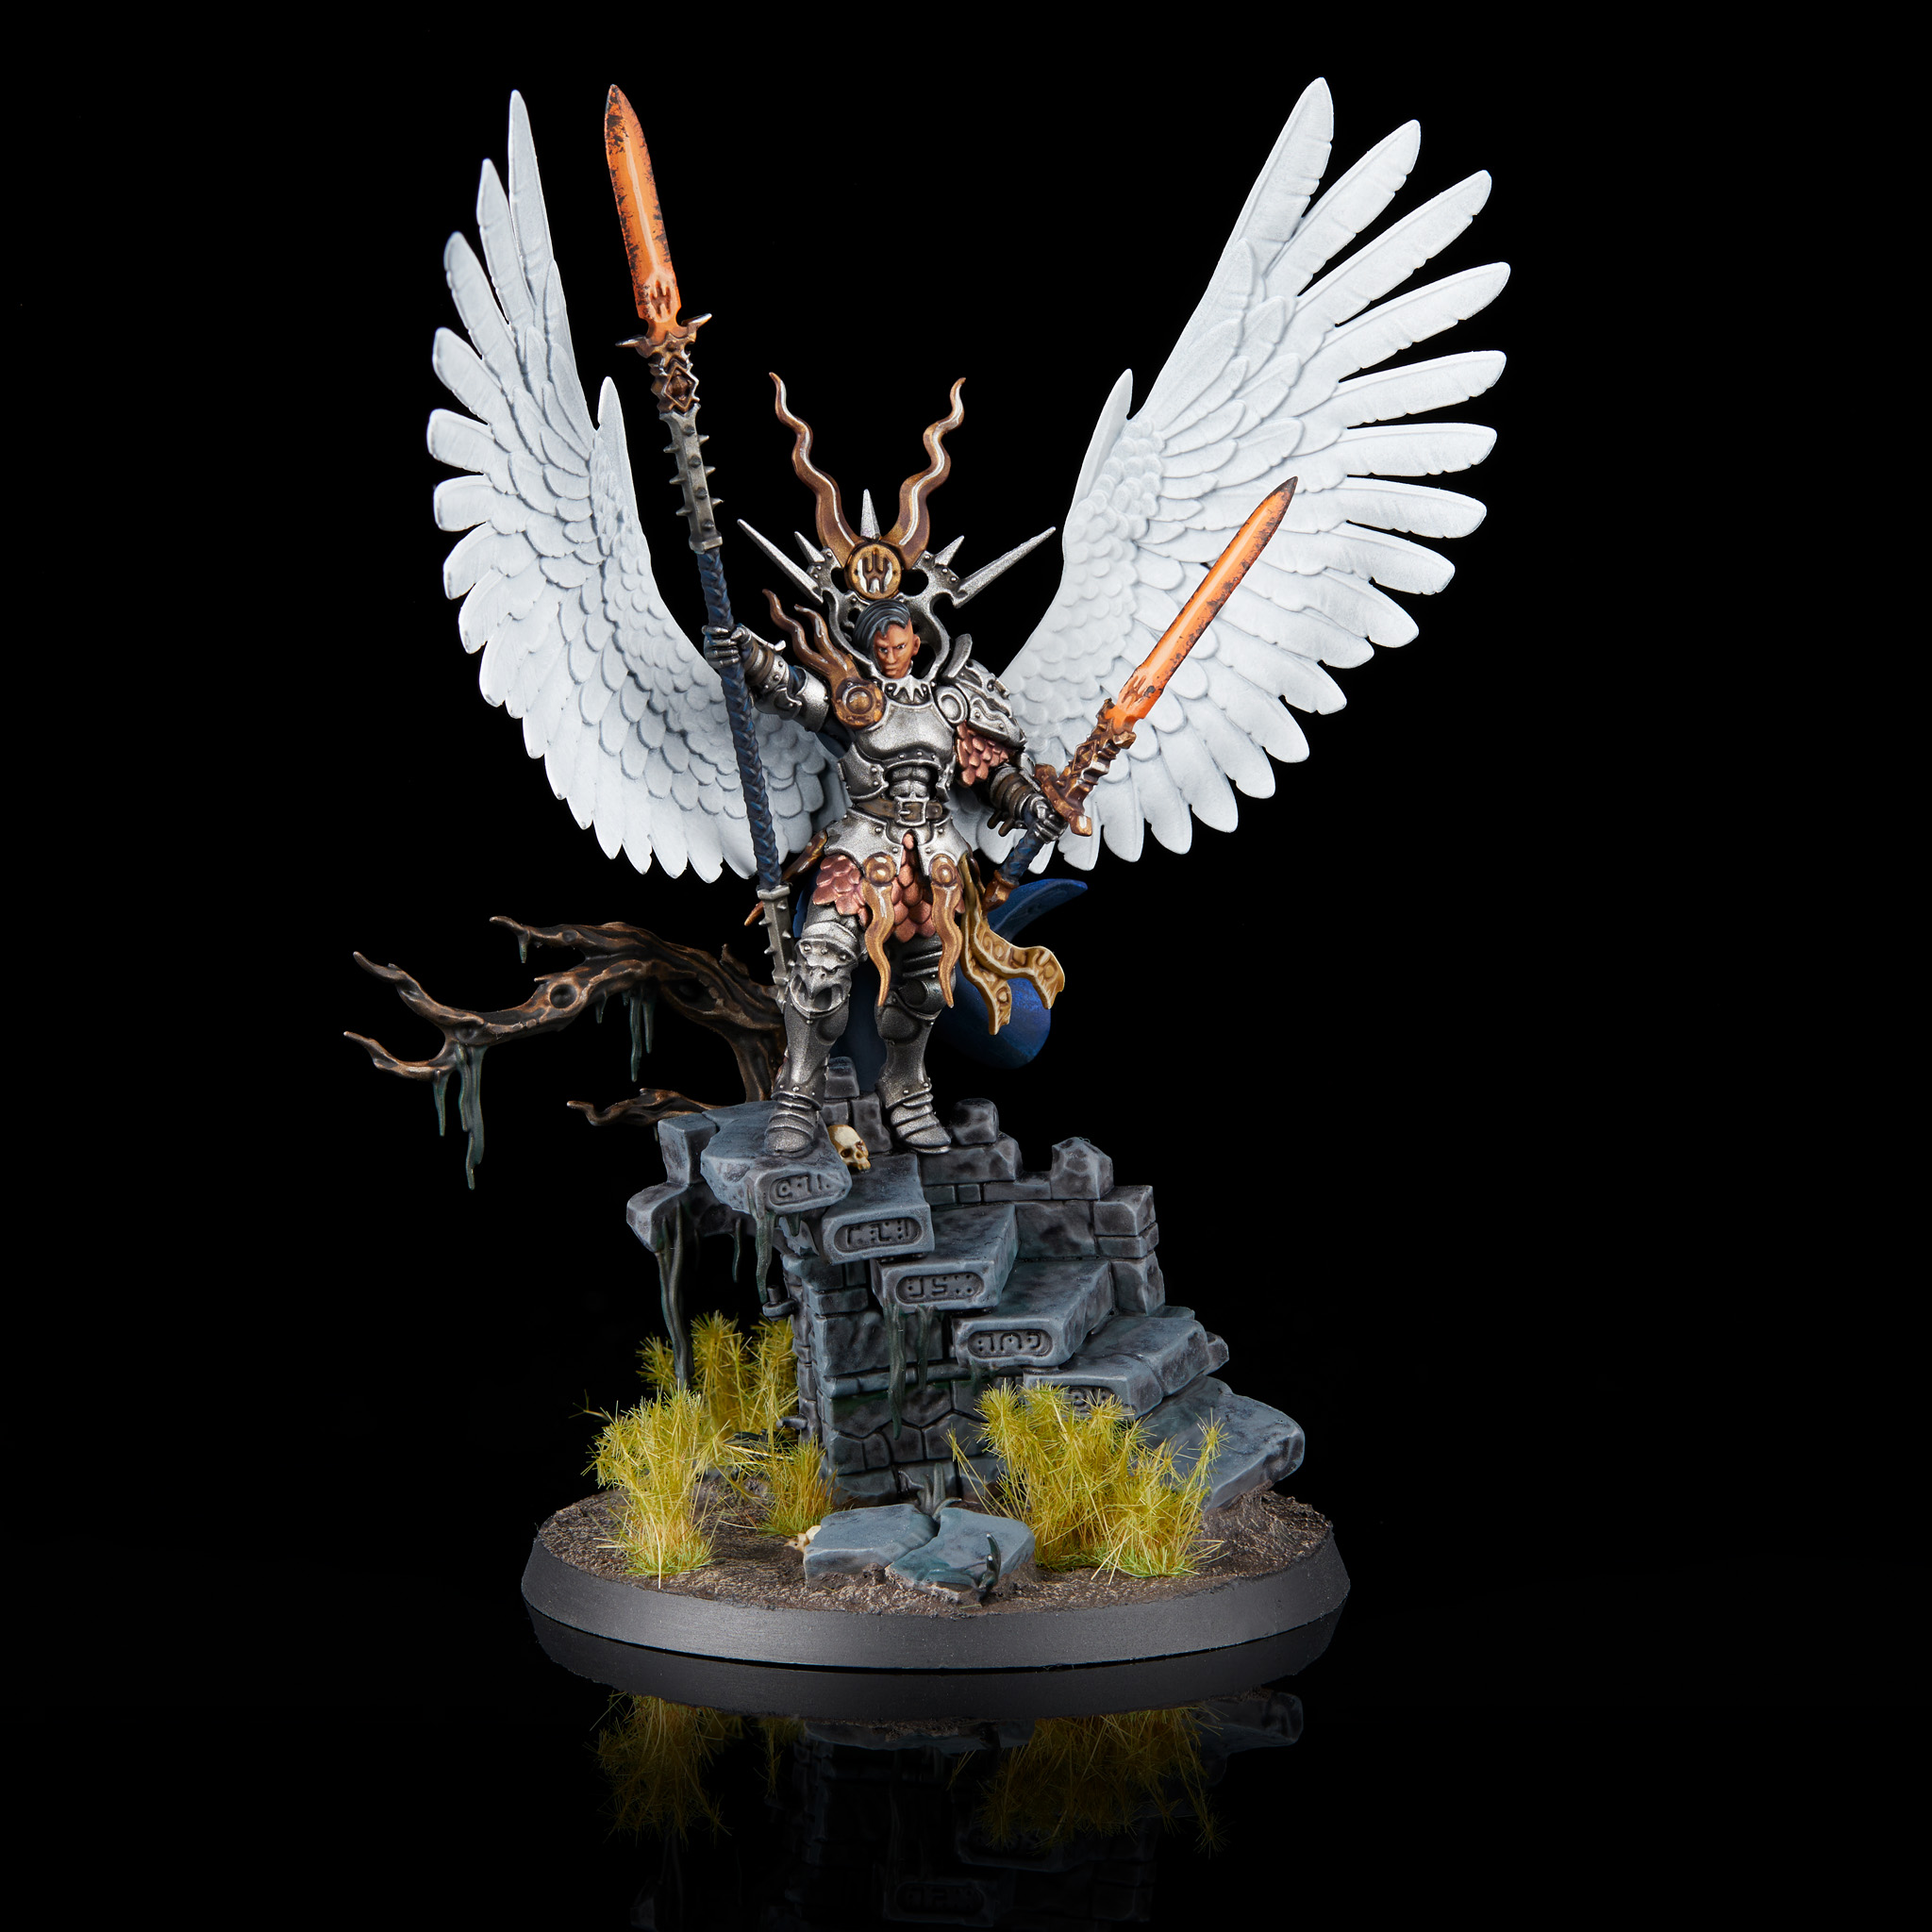 Yndrasta, the Celestial Spear